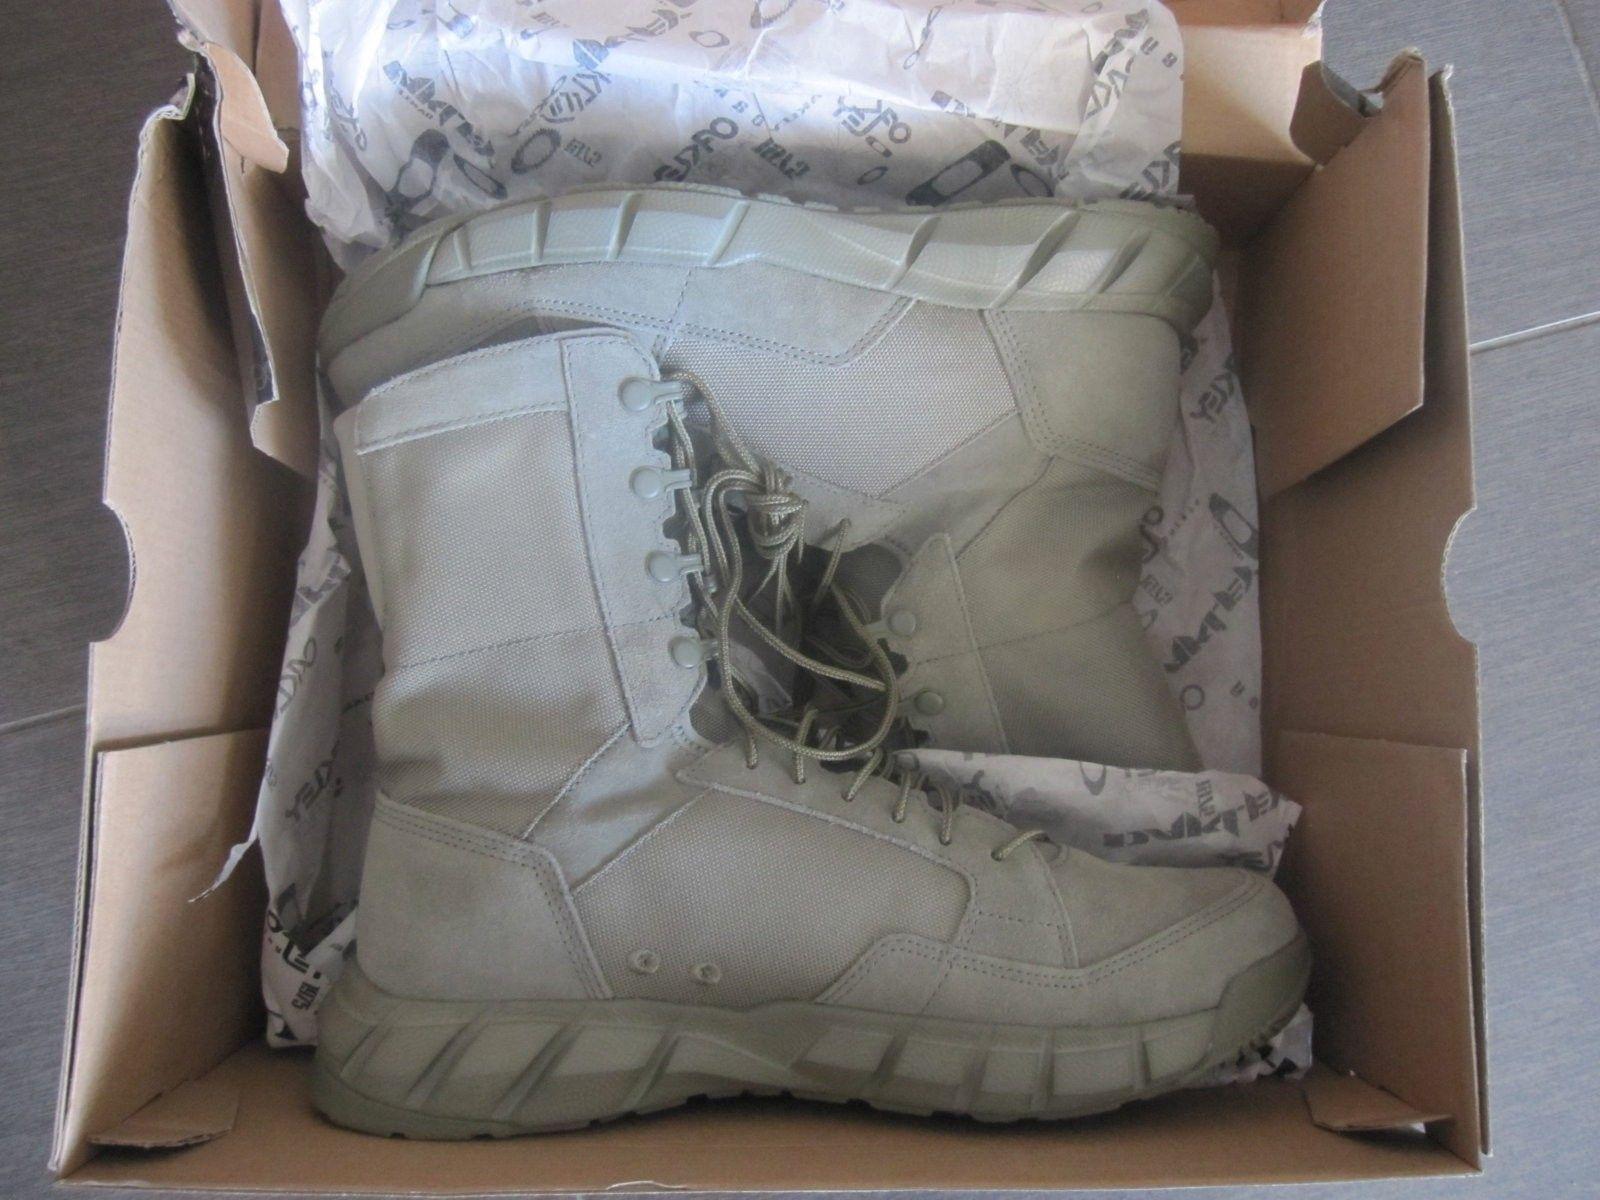 BNIB Light Assault Boots II - Size 10, color Sage Green Air Force - IMG_5033.JPG